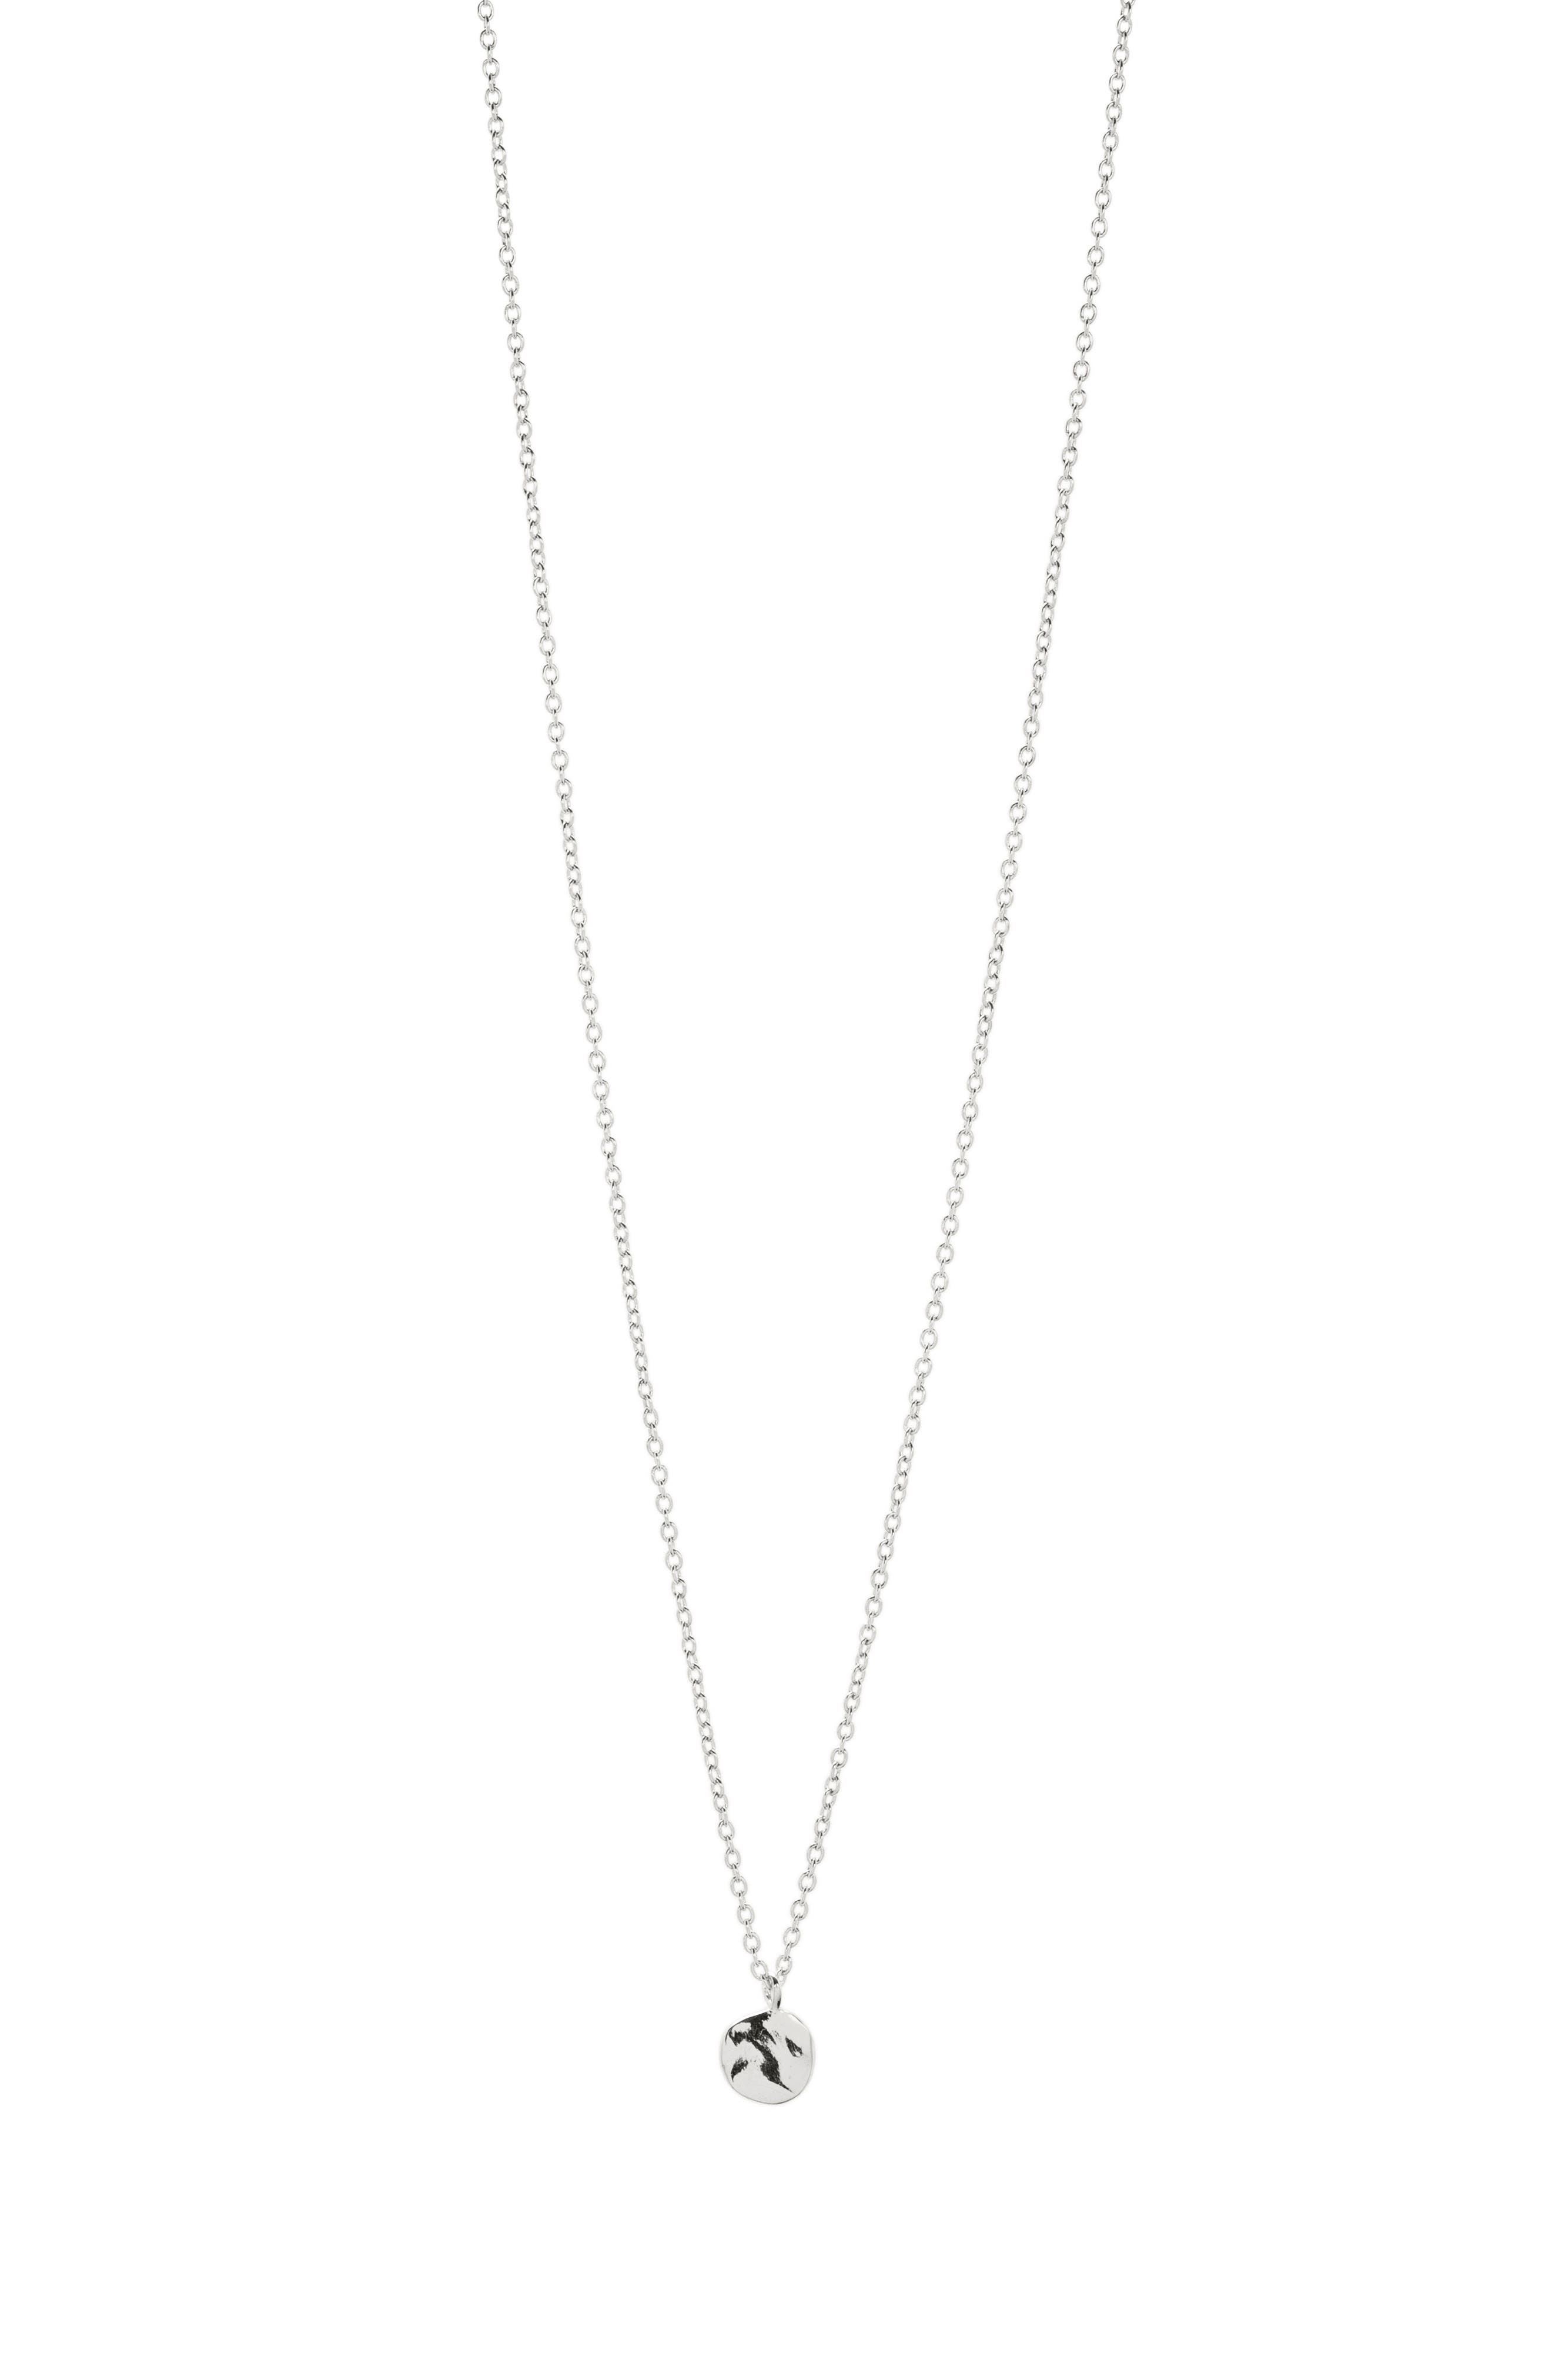 Chloe Small Pendant Necklace,                             Alternate thumbnail 4, color,                             SILVER